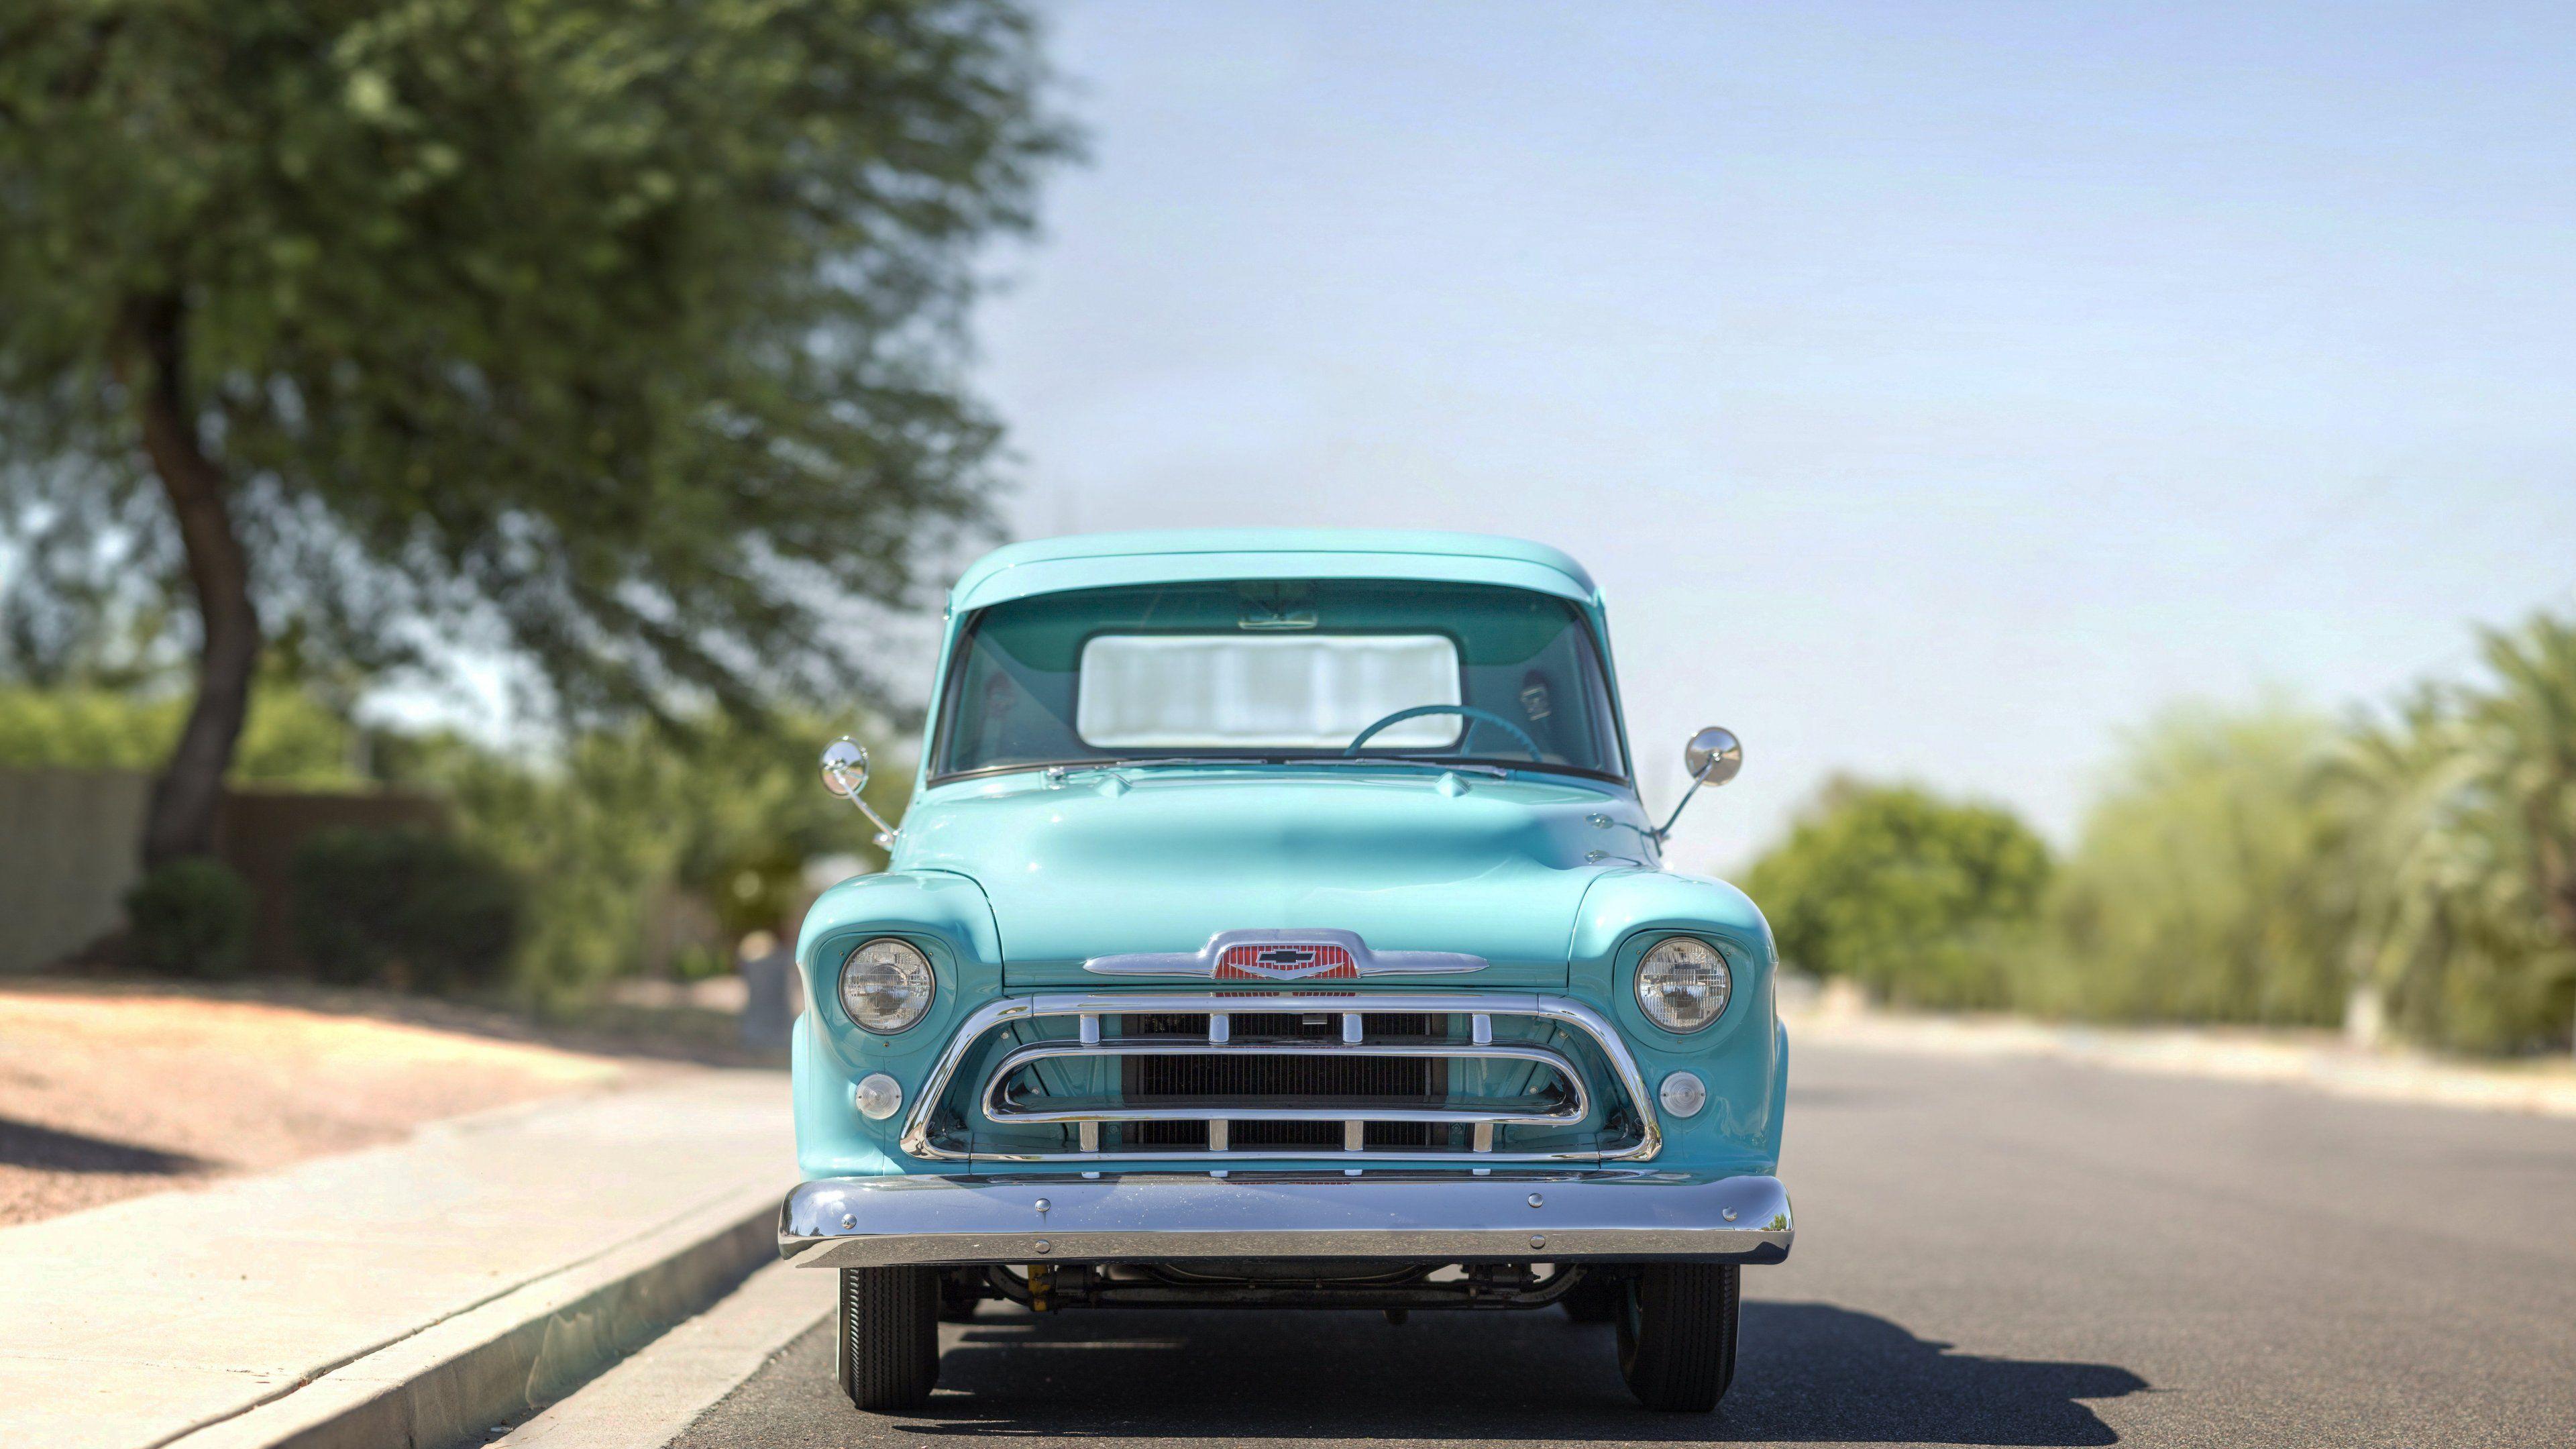 Vintage Classic Cars 4k Desktop Wallpapers - Wallpaper Cave